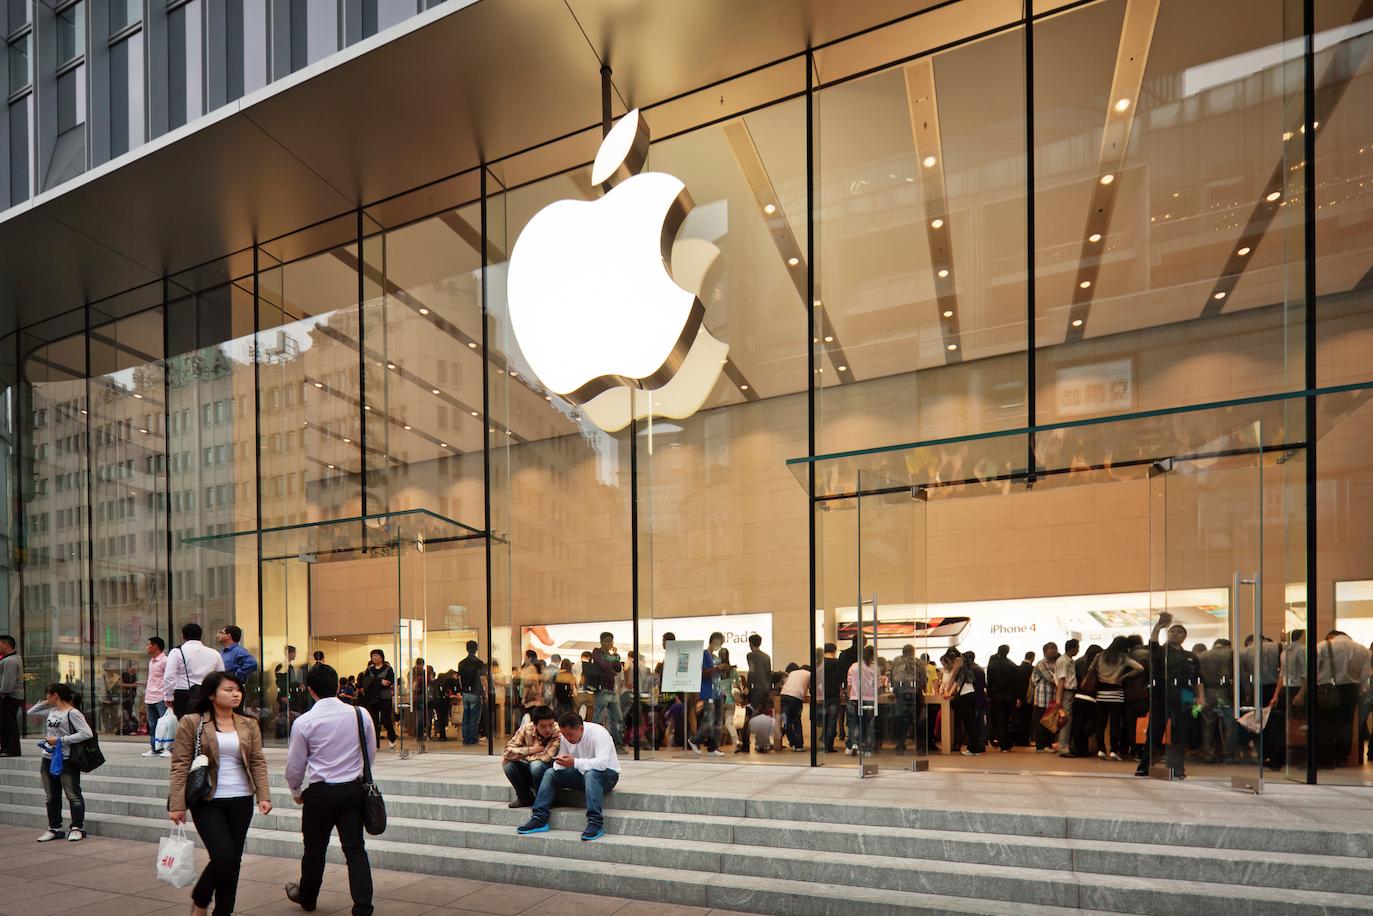 EEUU ya desbloqueó un iPhone 11 sin ayuda de la empresa Apple - N ...